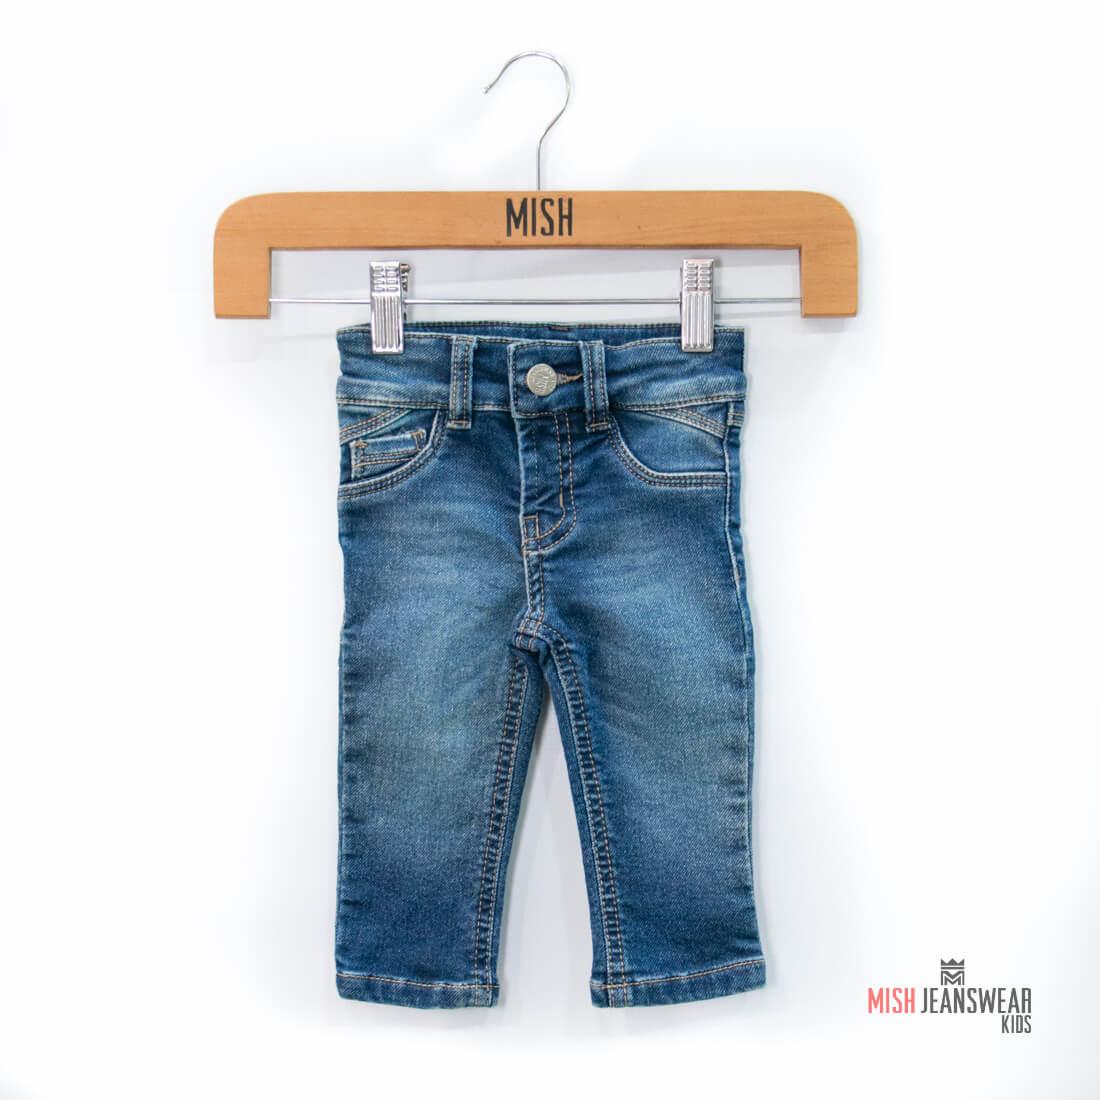 bee4b8a81 Calça jeans infantil moletom Mish bebê masculina